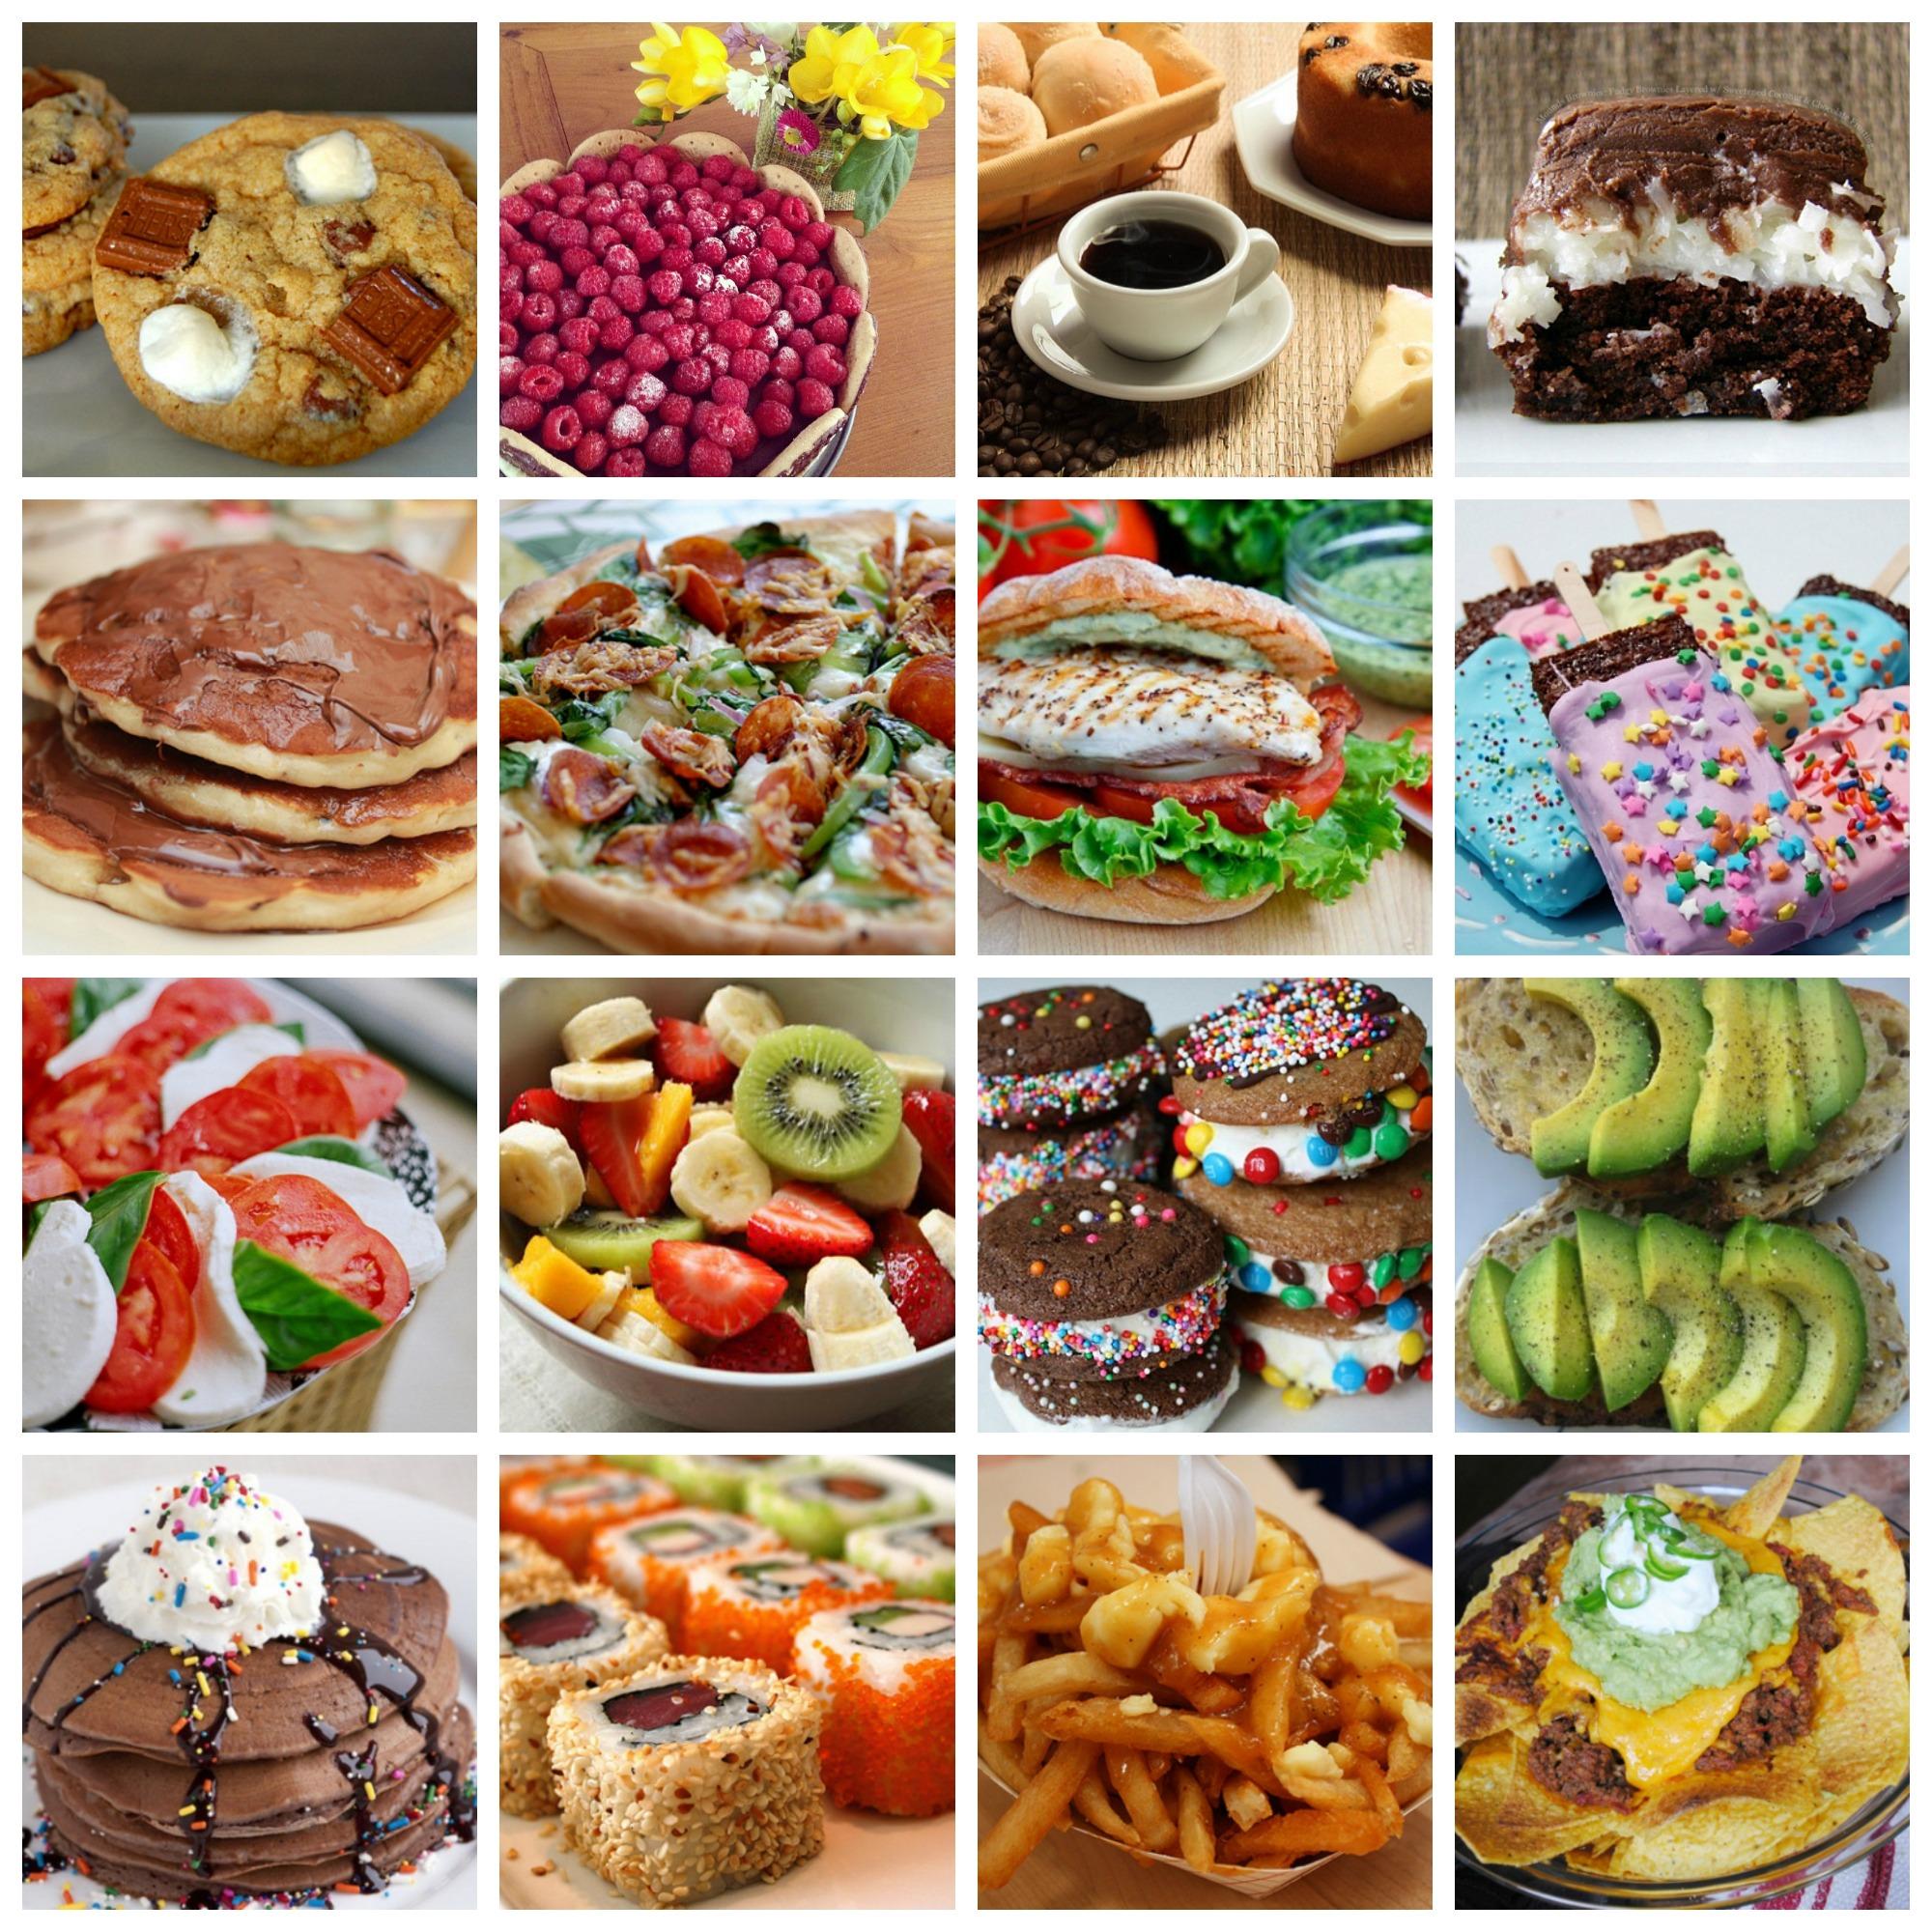 Transtorno Alimentar e Instagram